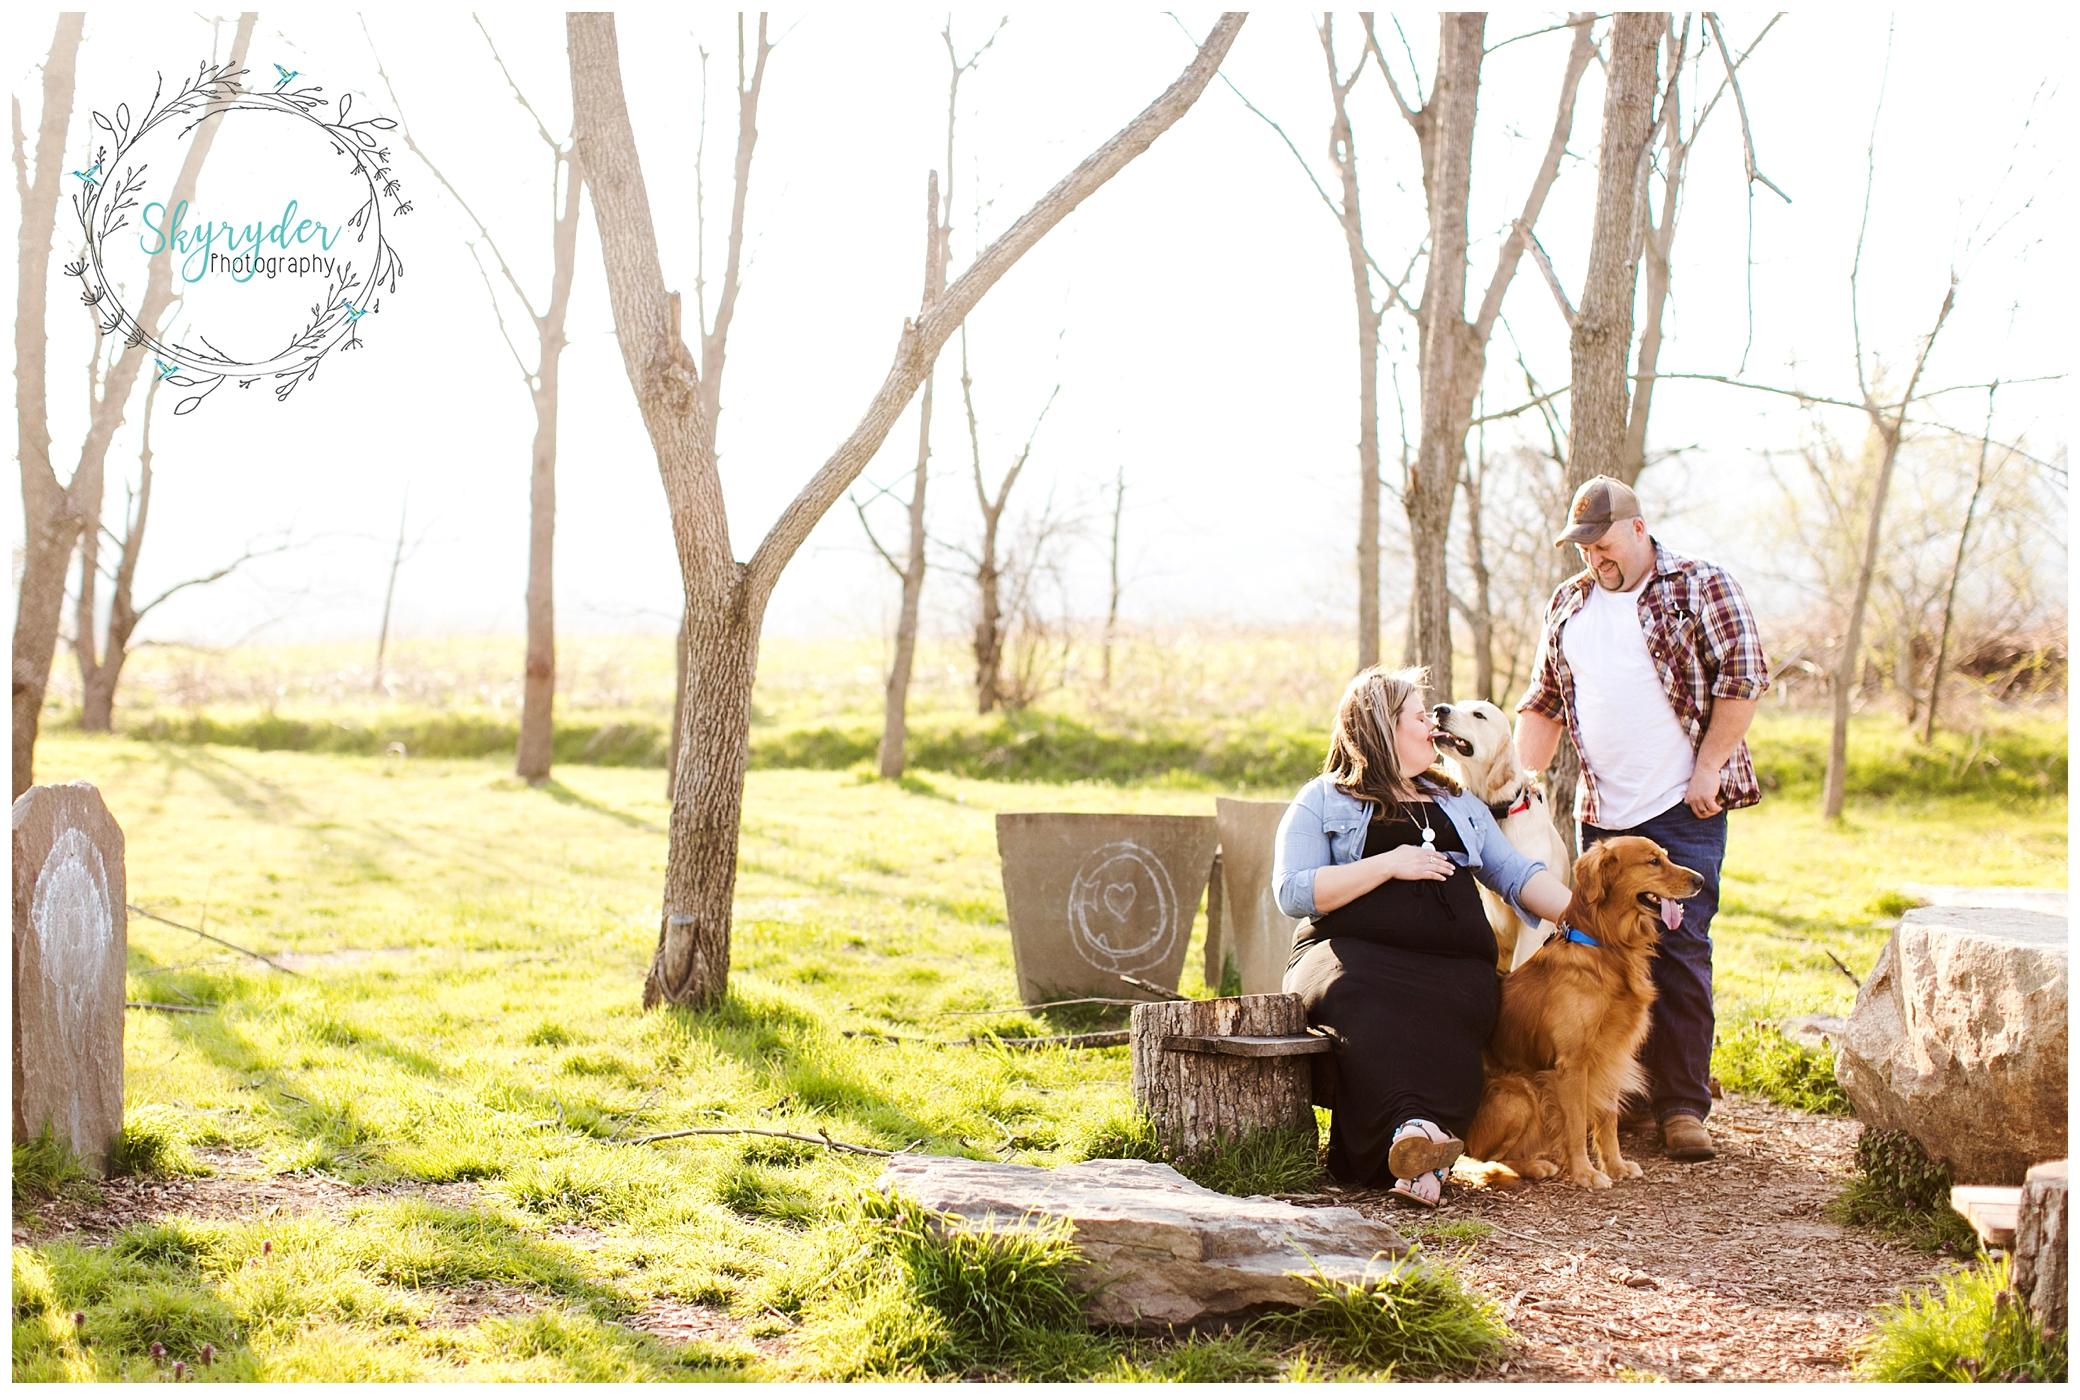 Kelsey & Ricky | Blacksburg Maternity Photographer | Heritage Park